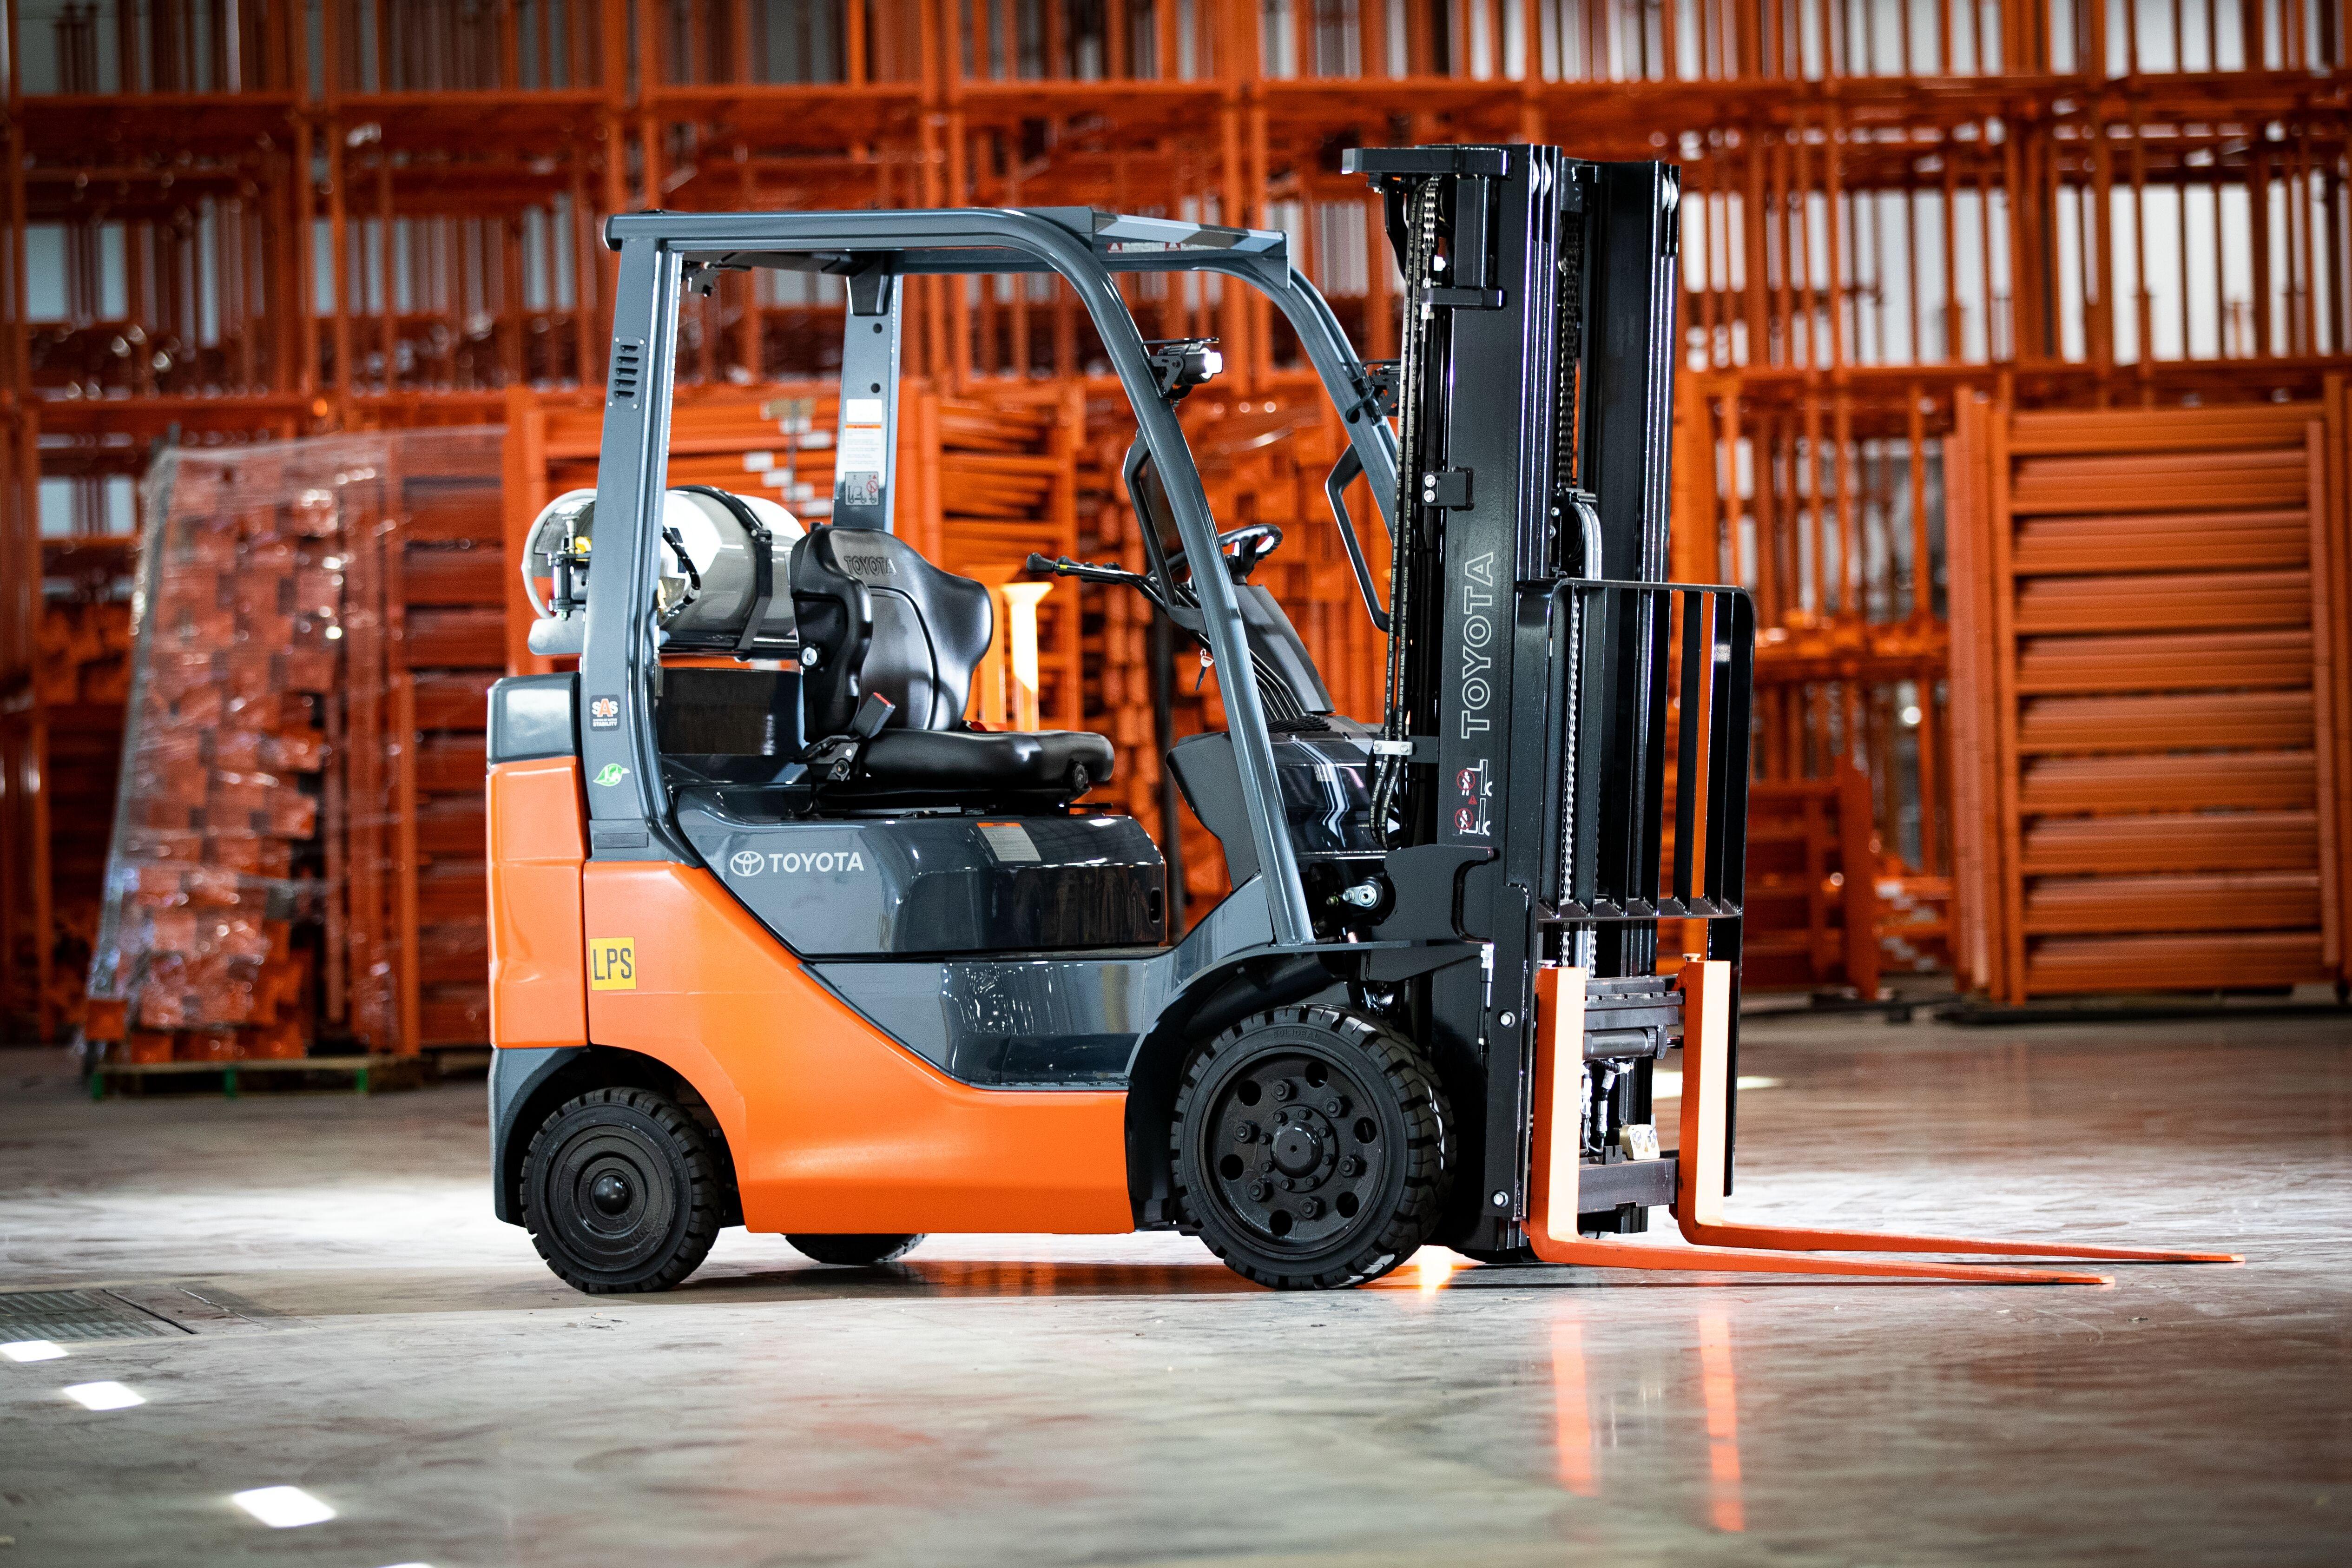 Used, 2014, Toyota Industrial Equipment, 8FGCU15, Forklifts / Lift Trucks